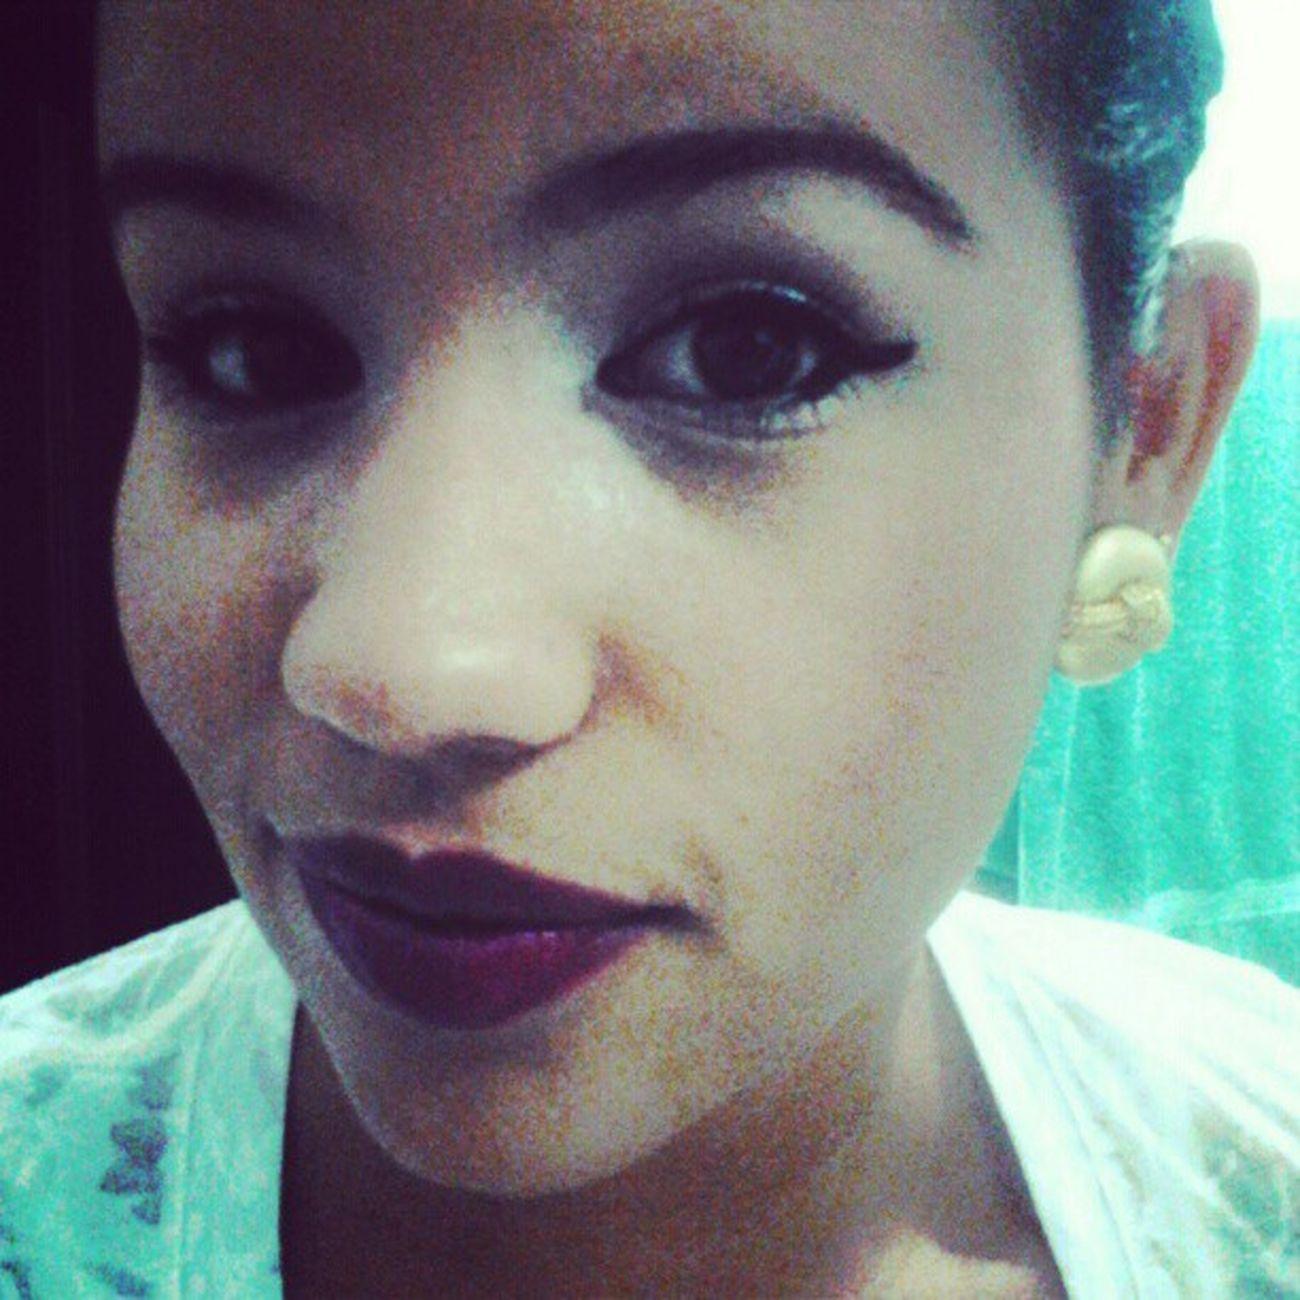 Purple lipstick rocked the night LastNight Randomnight OutWithGirls